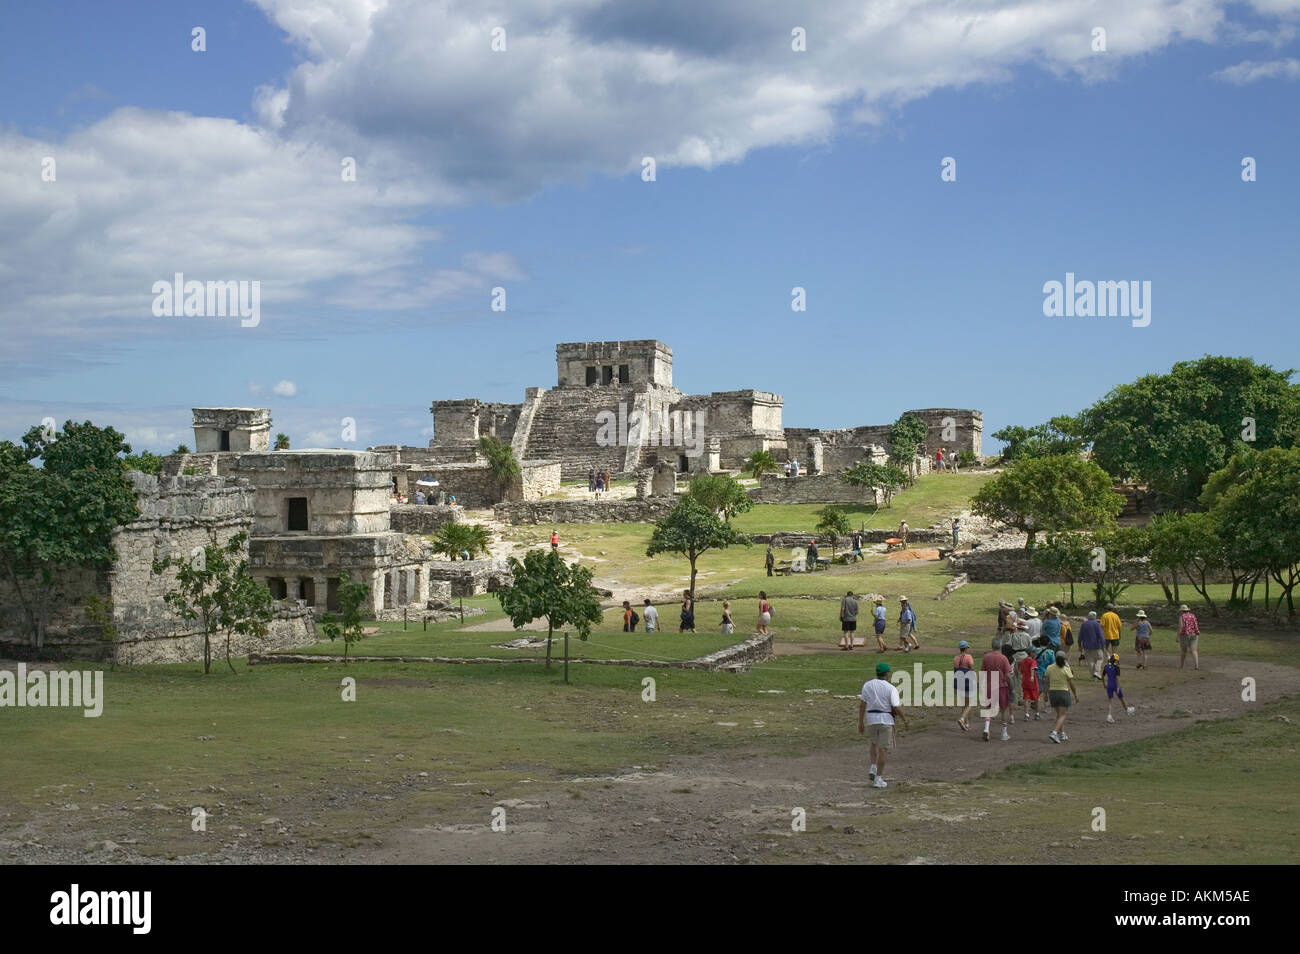 Mayan ruins Tulum Mexico - Stock Image